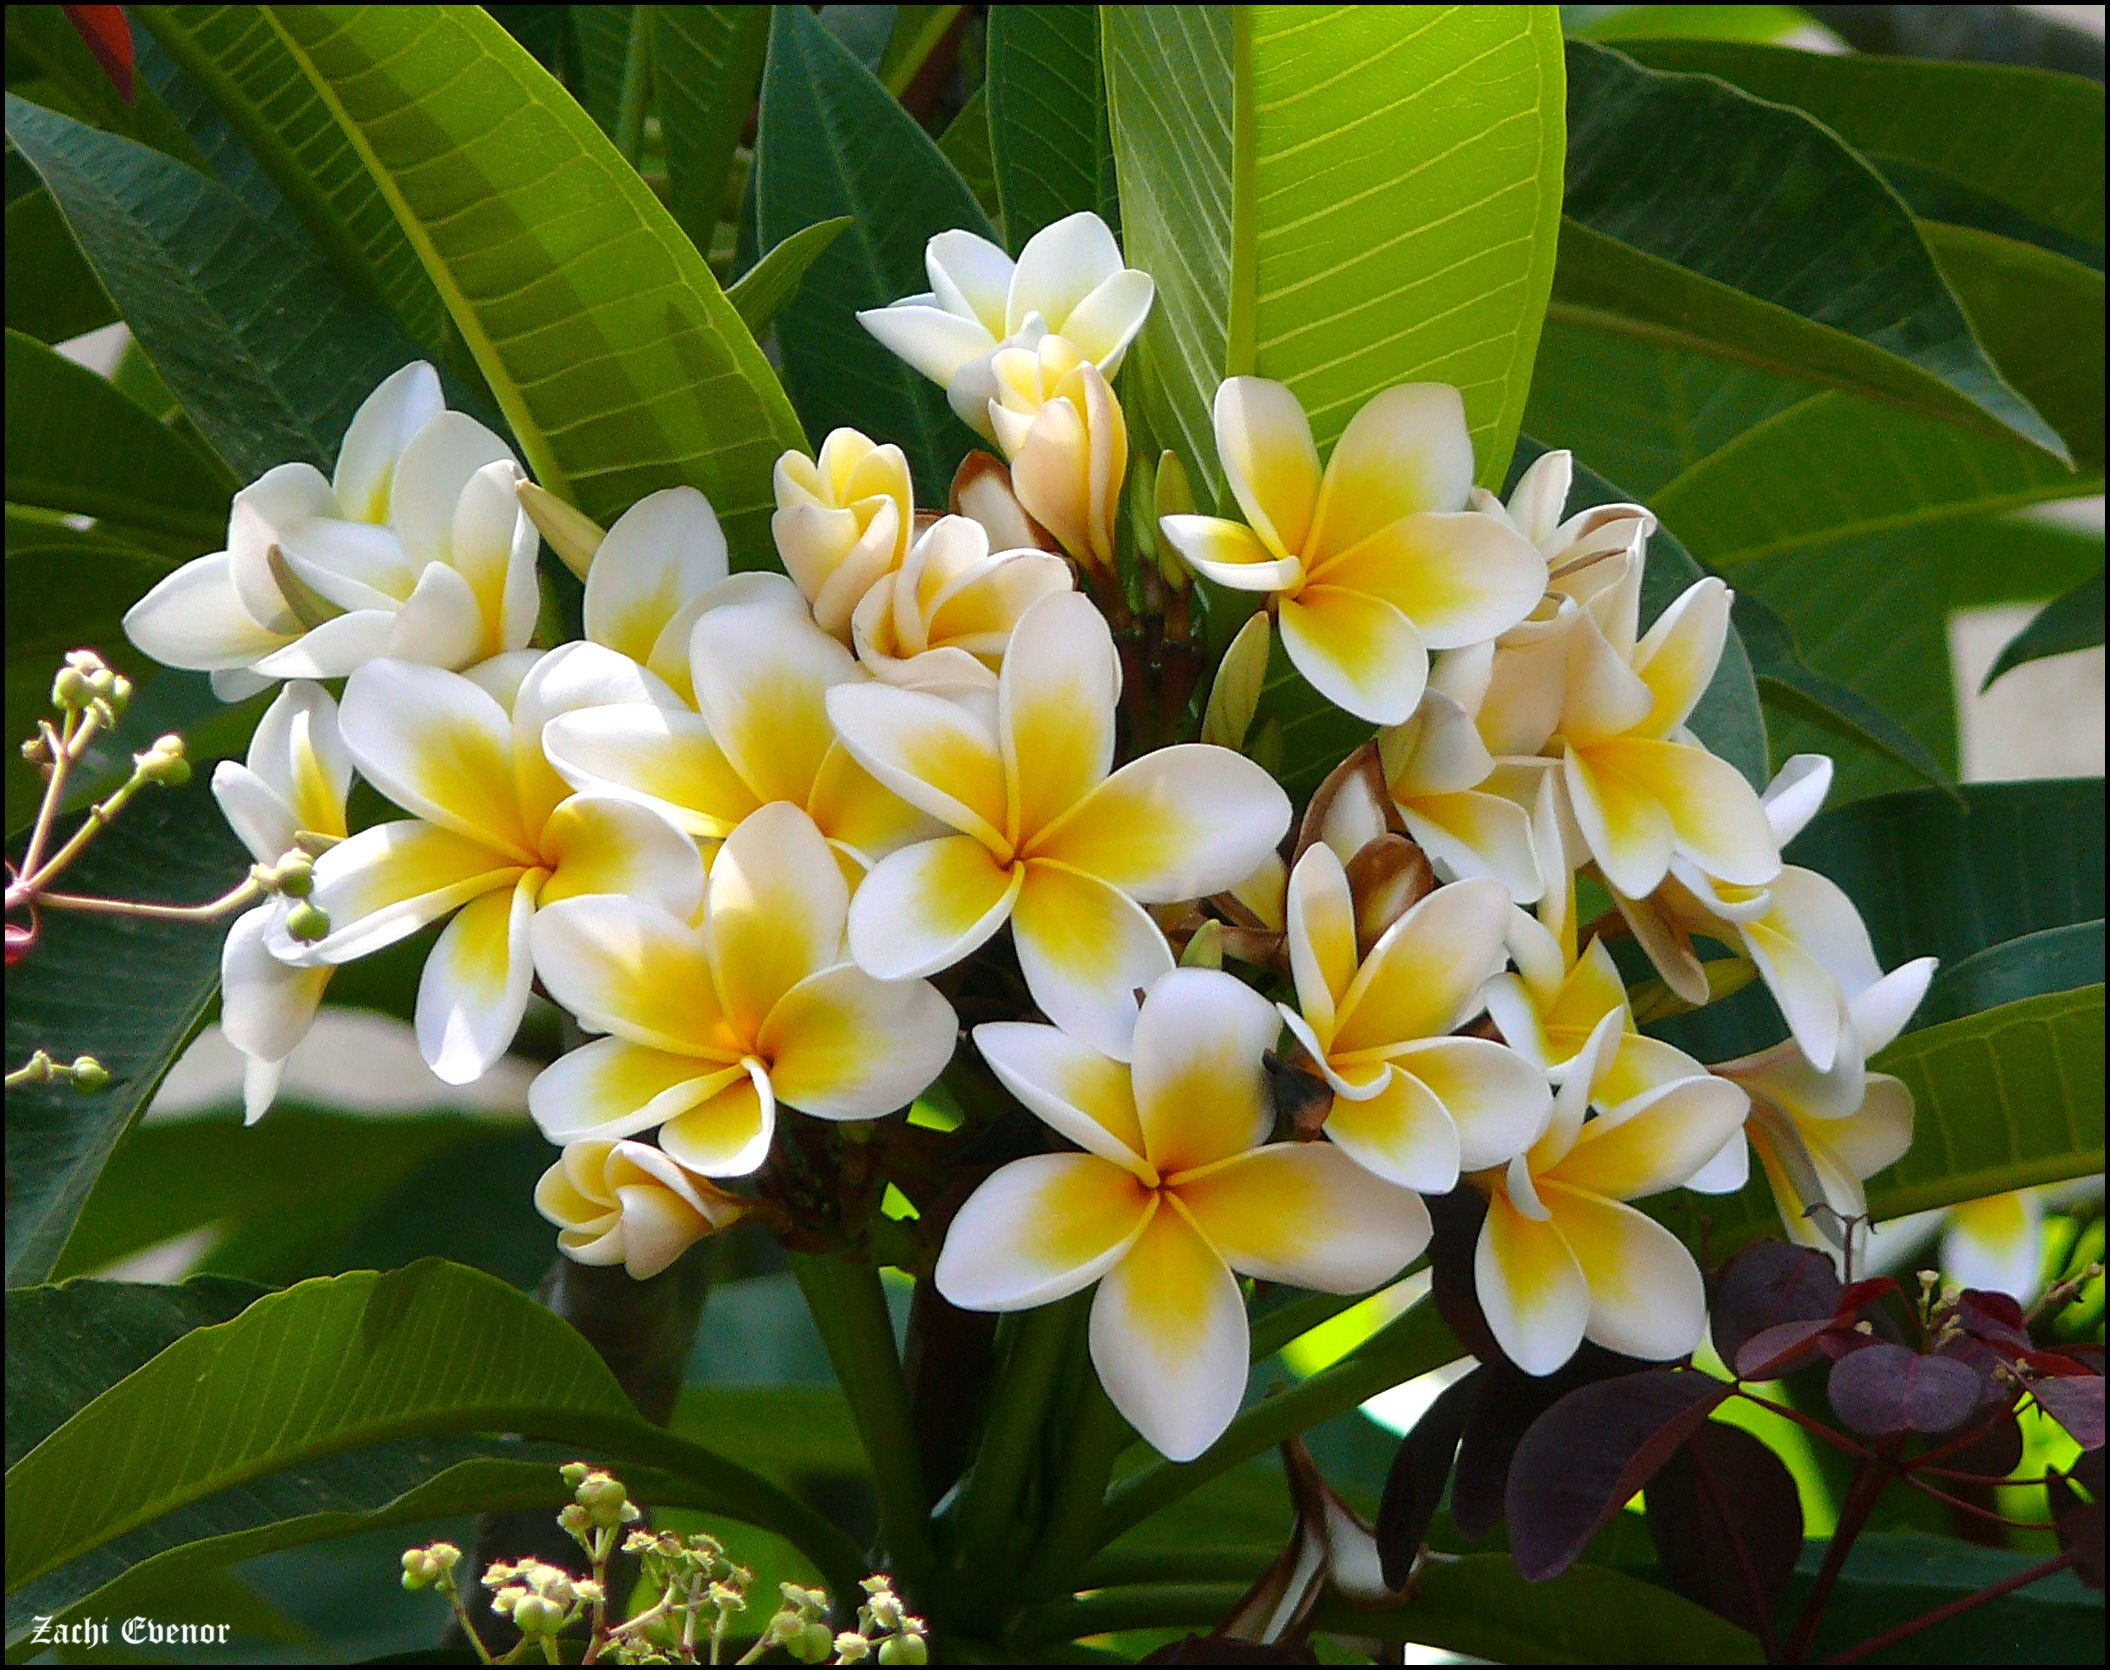 Growing the White Frangipani (Plumeria Alba) in the Home ...